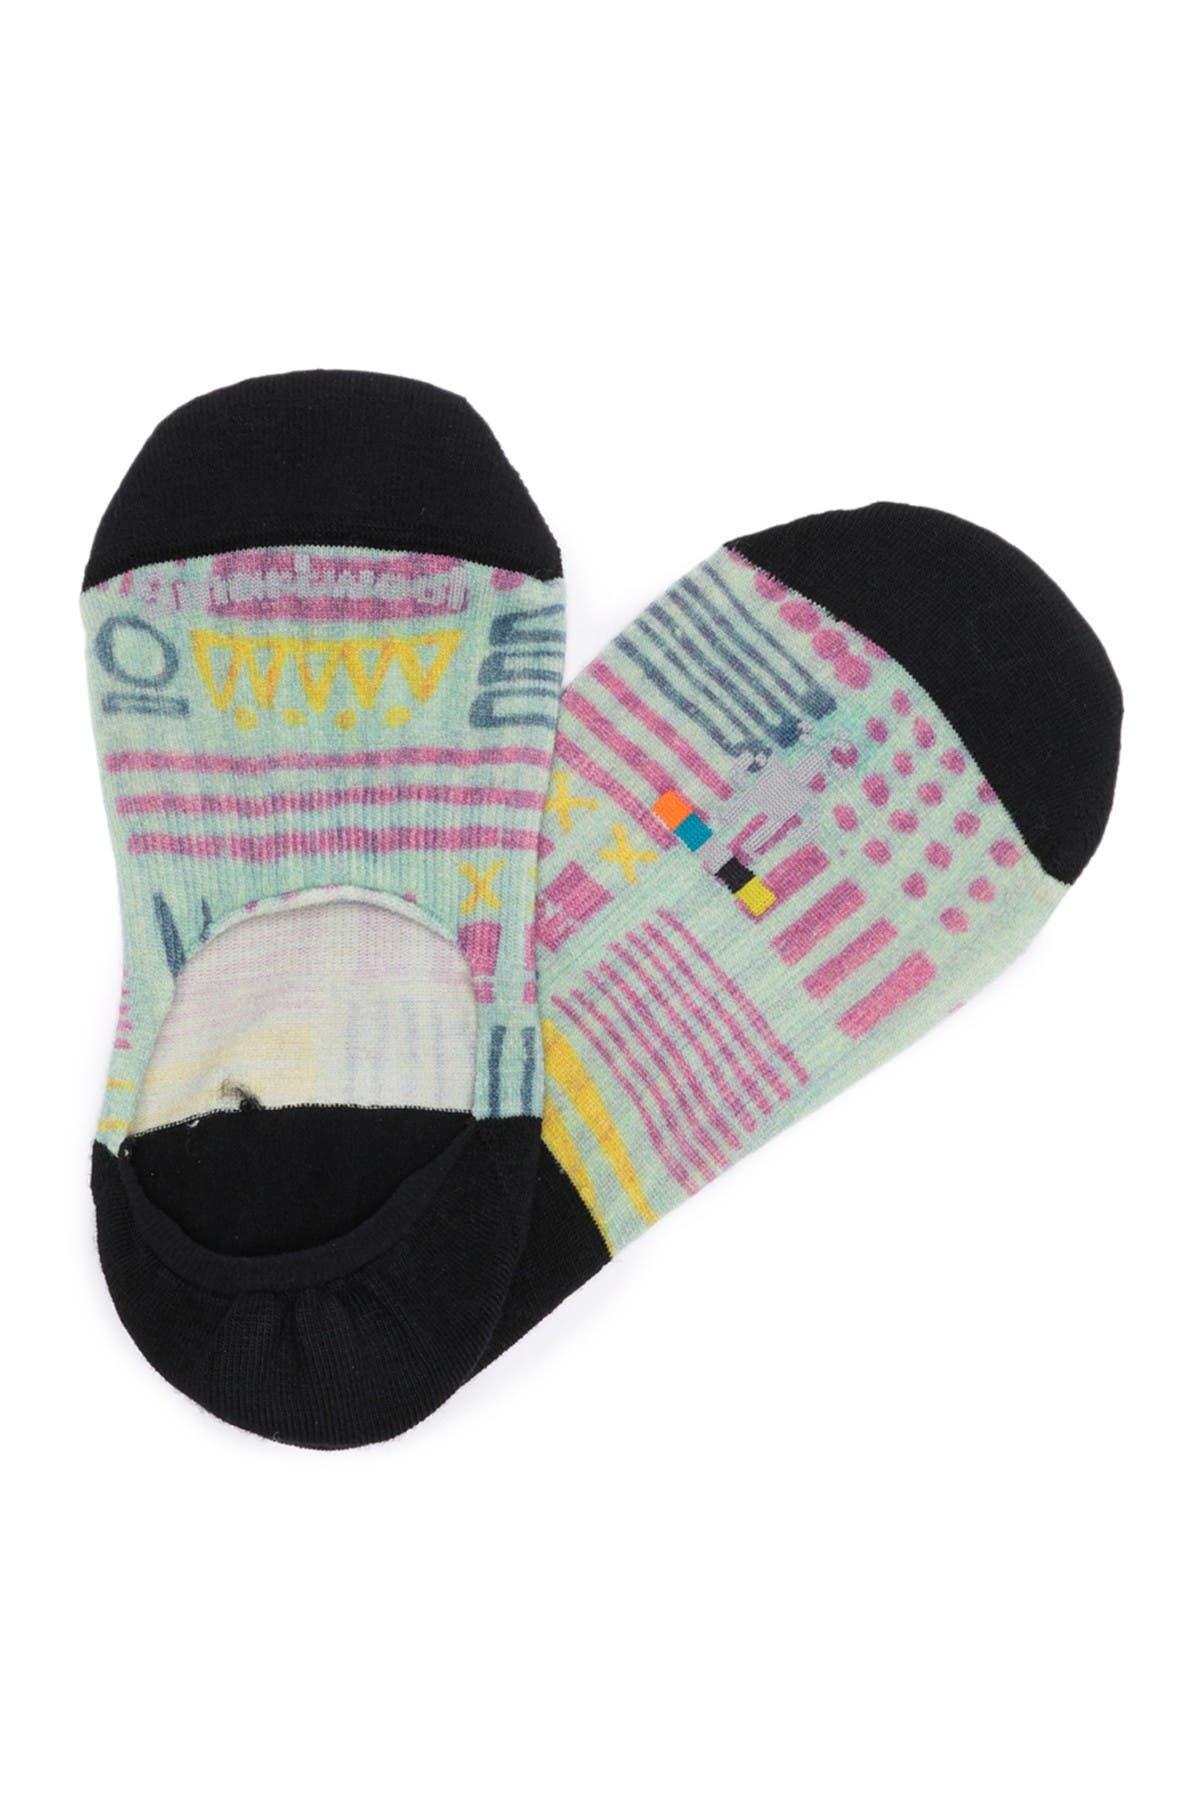 Image of SmartWool Curated Haiku Mood No Show Socks